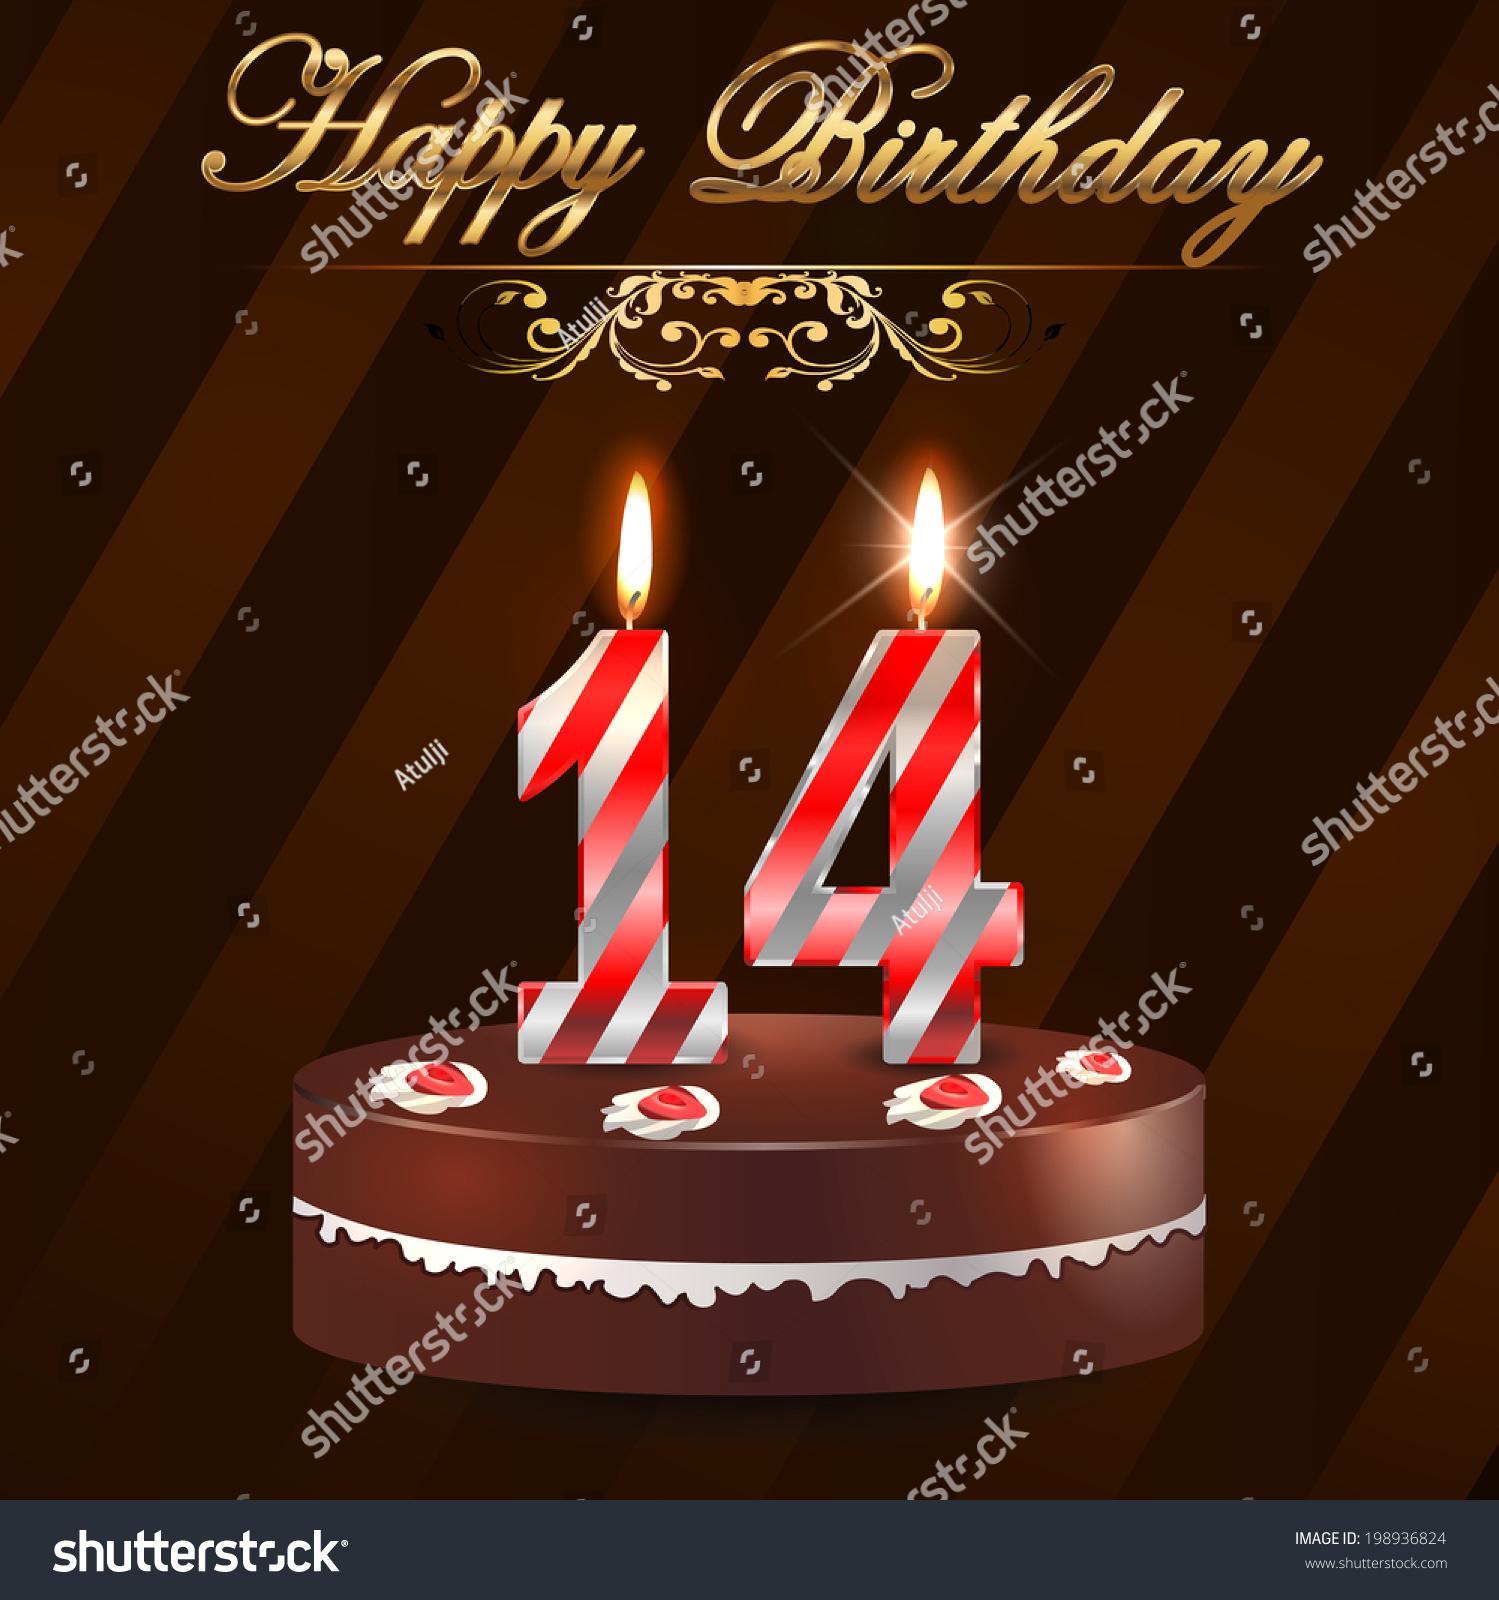 14 Year Happy Birthday Card Cake Stock Vector 198936824 ...